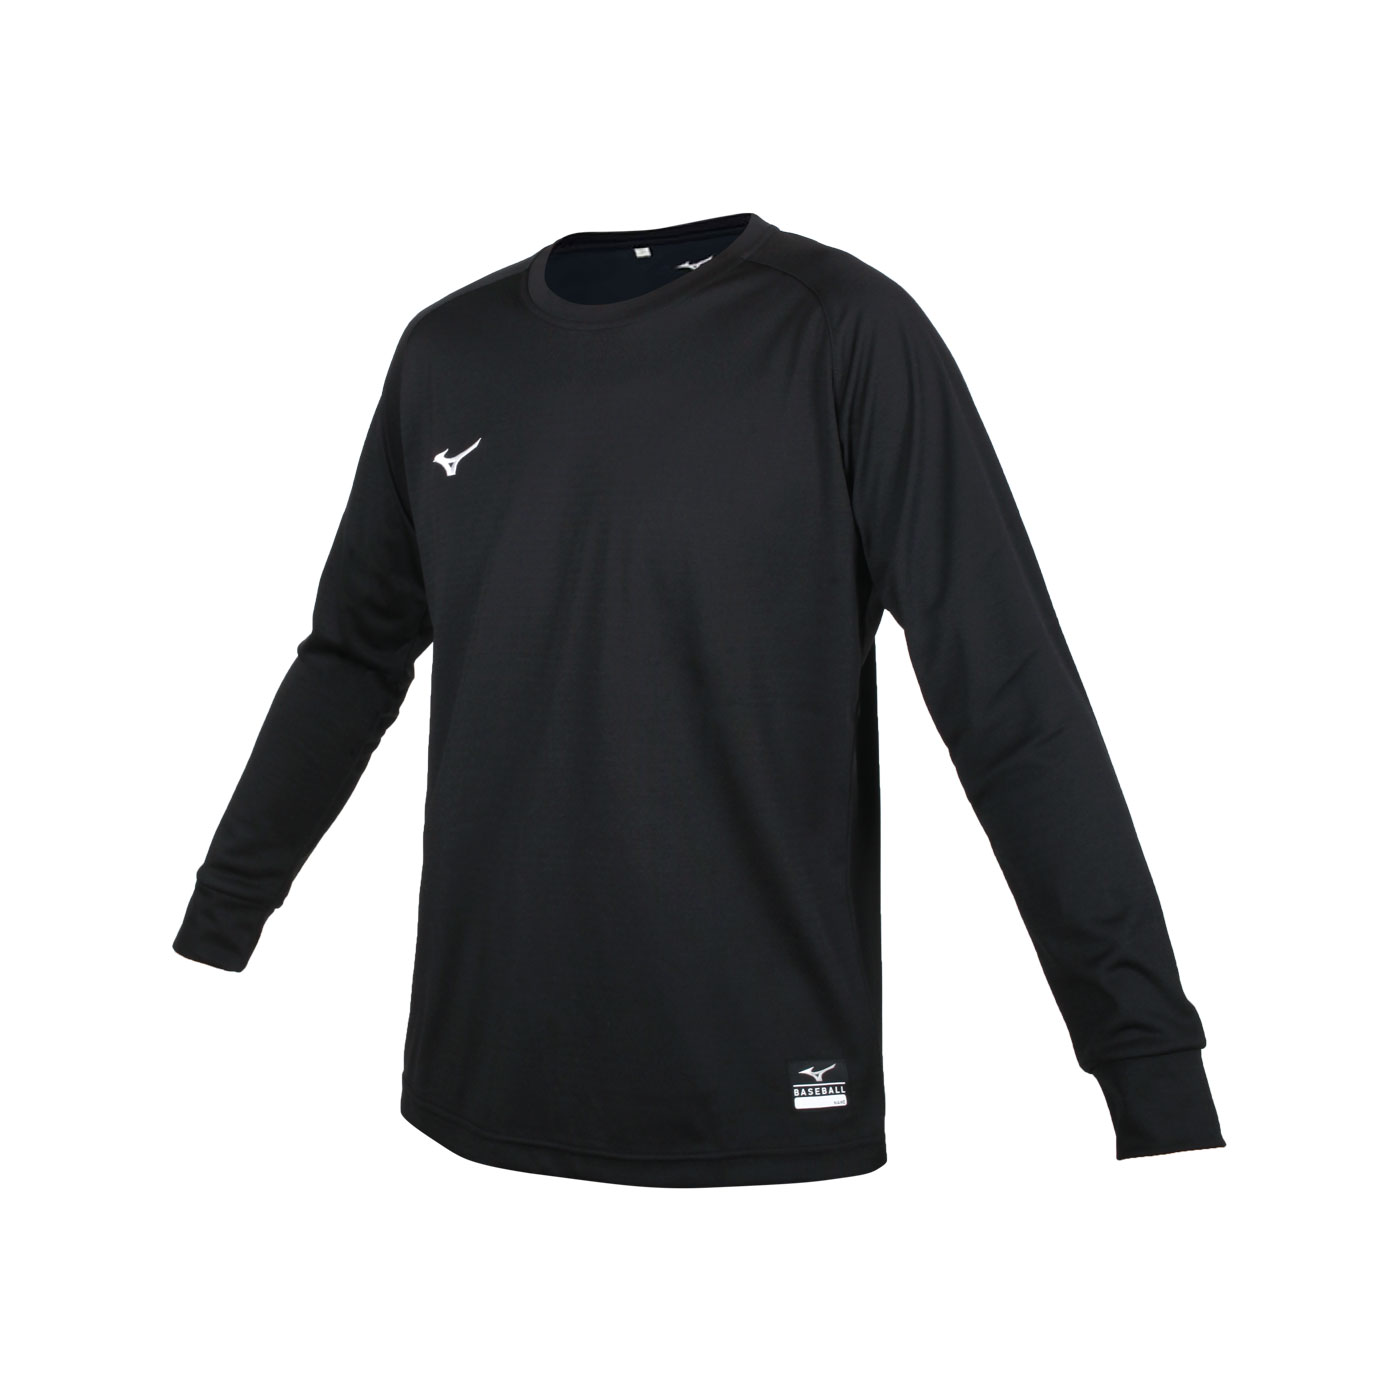 MIZUNO 男款長袖T恤 12TC0L3109 - 黑白